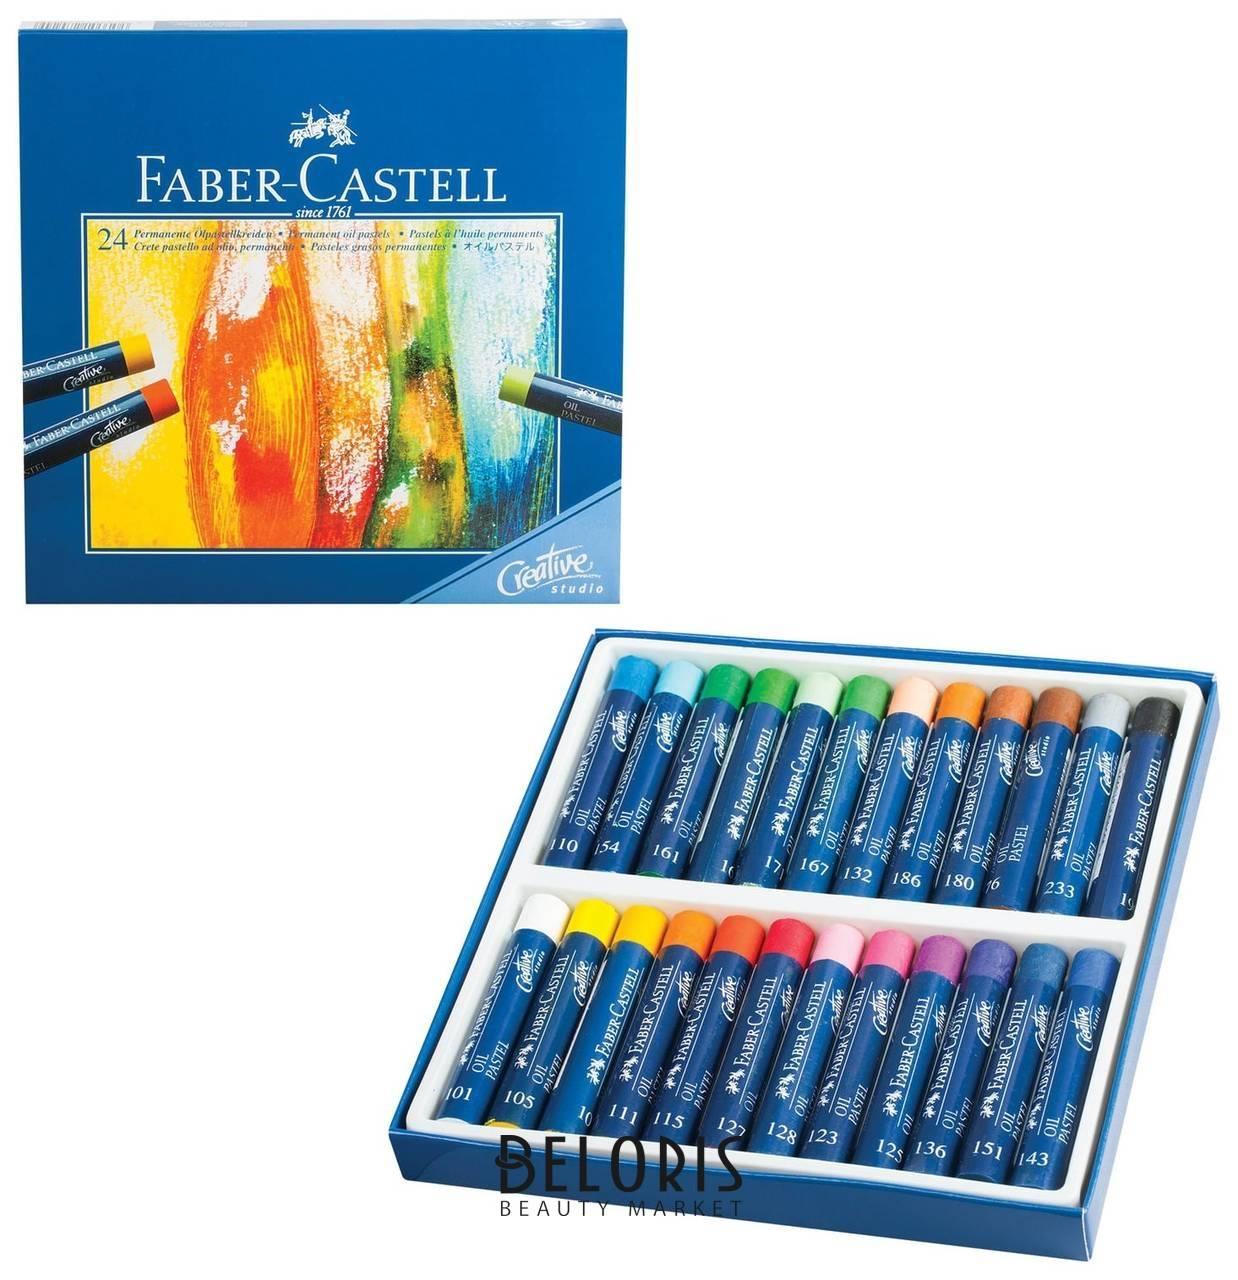 Пастель масляная художественная Faber-castell Oil Pastels, 24 цвета, круглое сечение Faber-castell